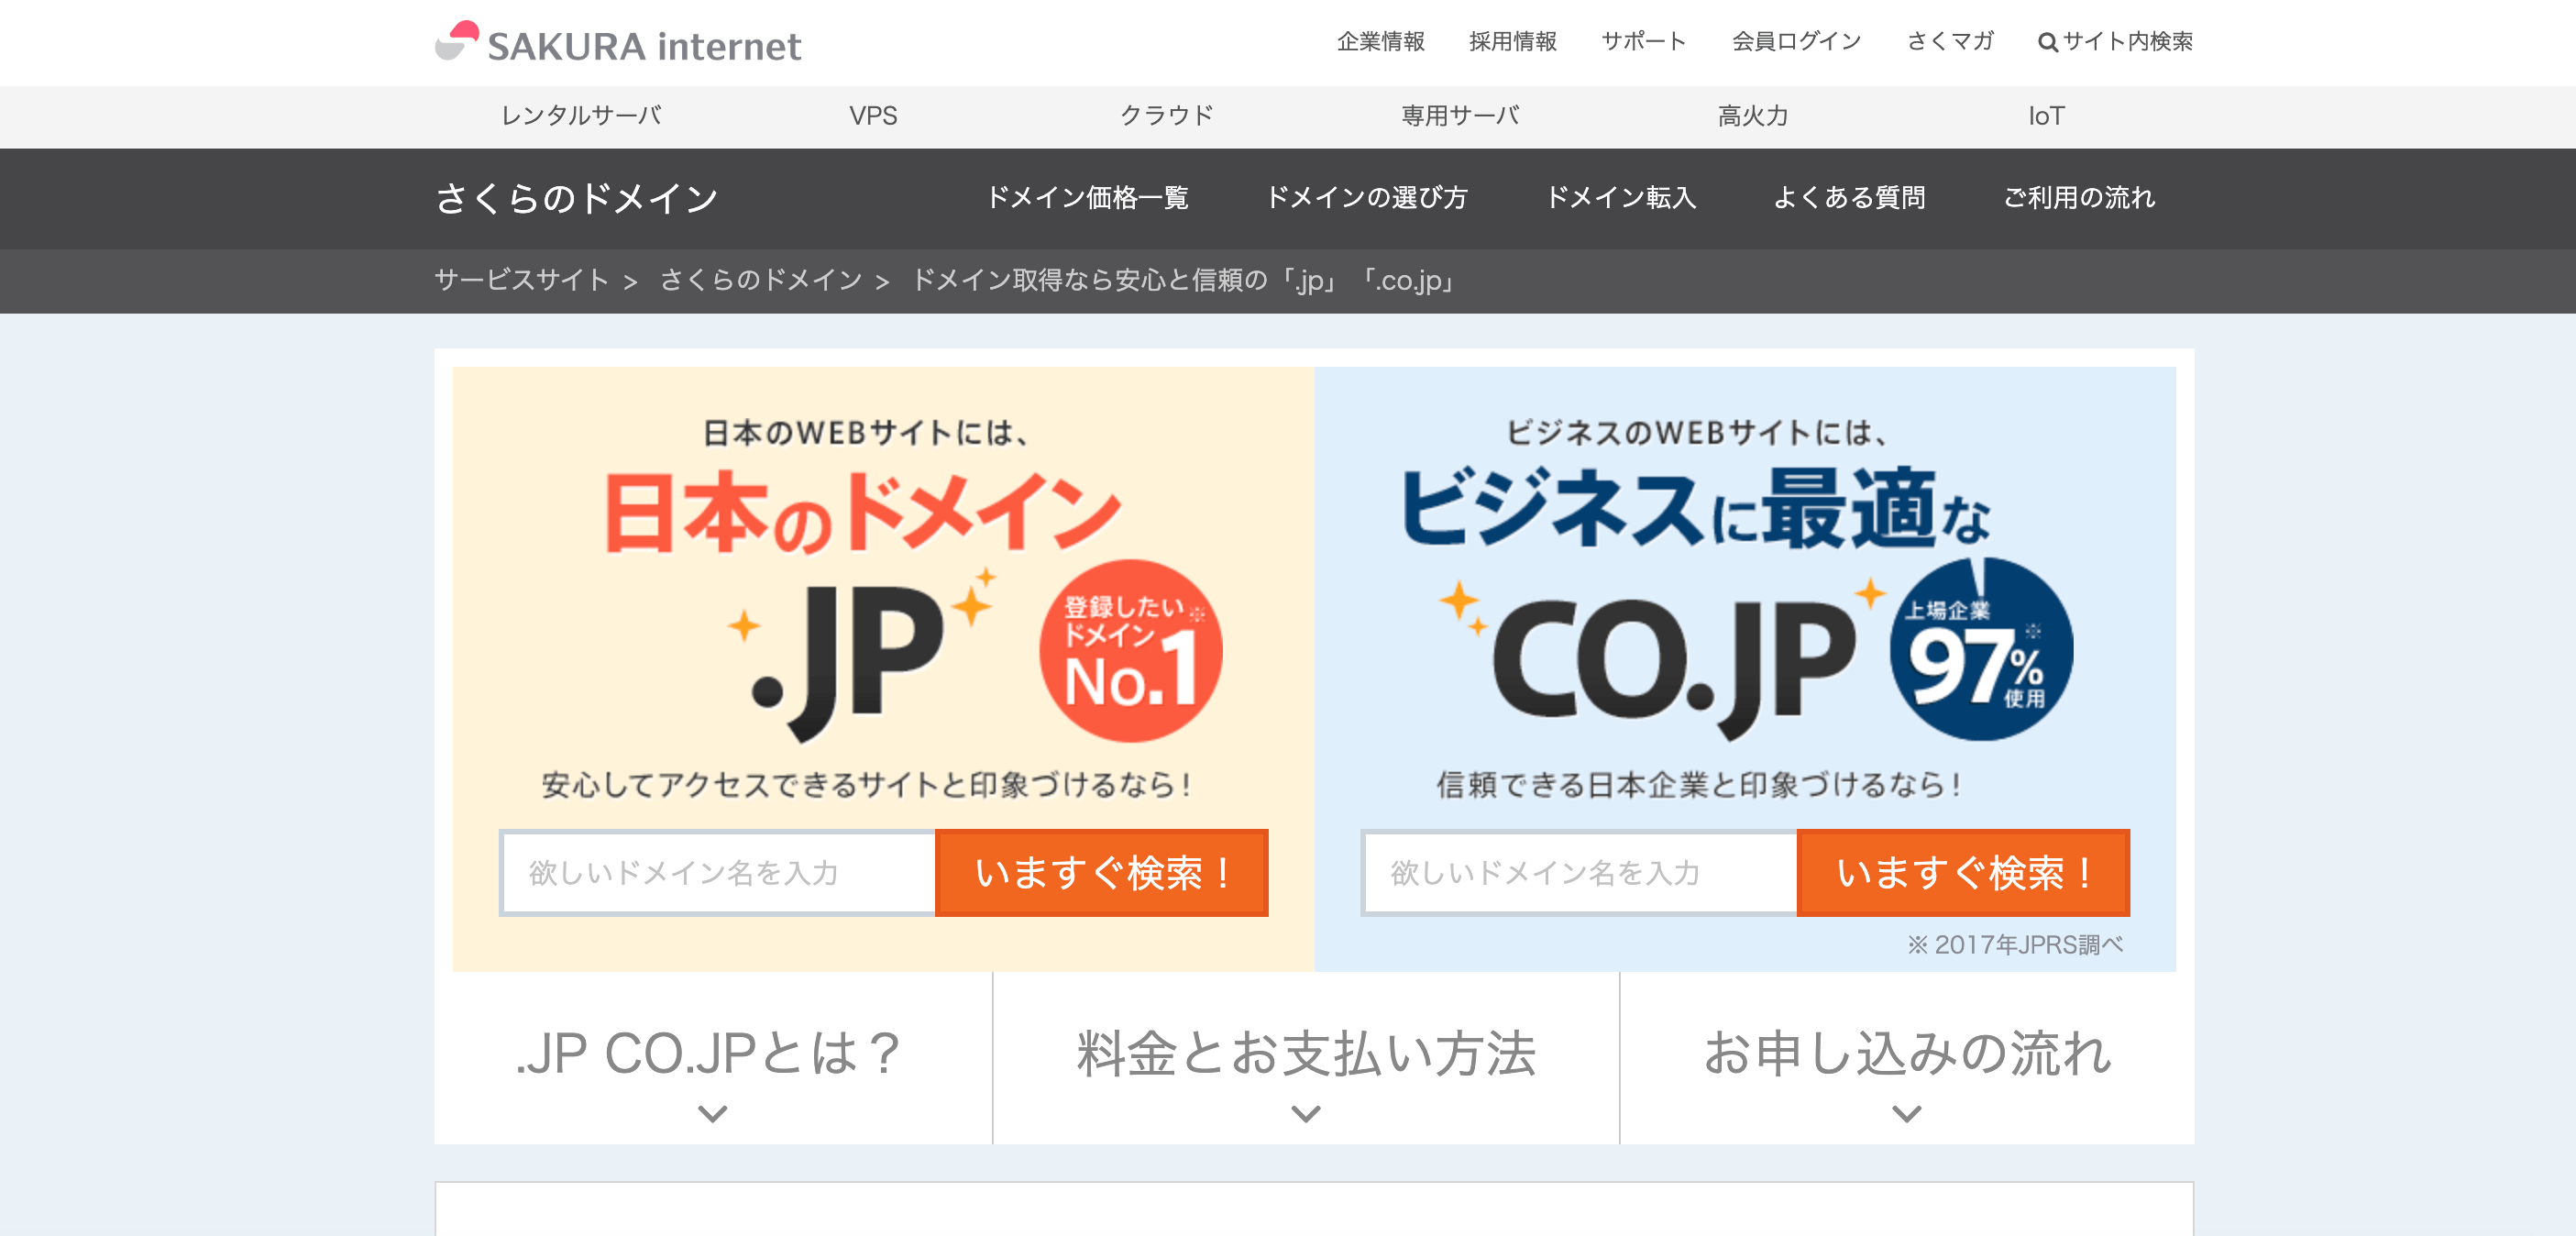 sakurainternet.png